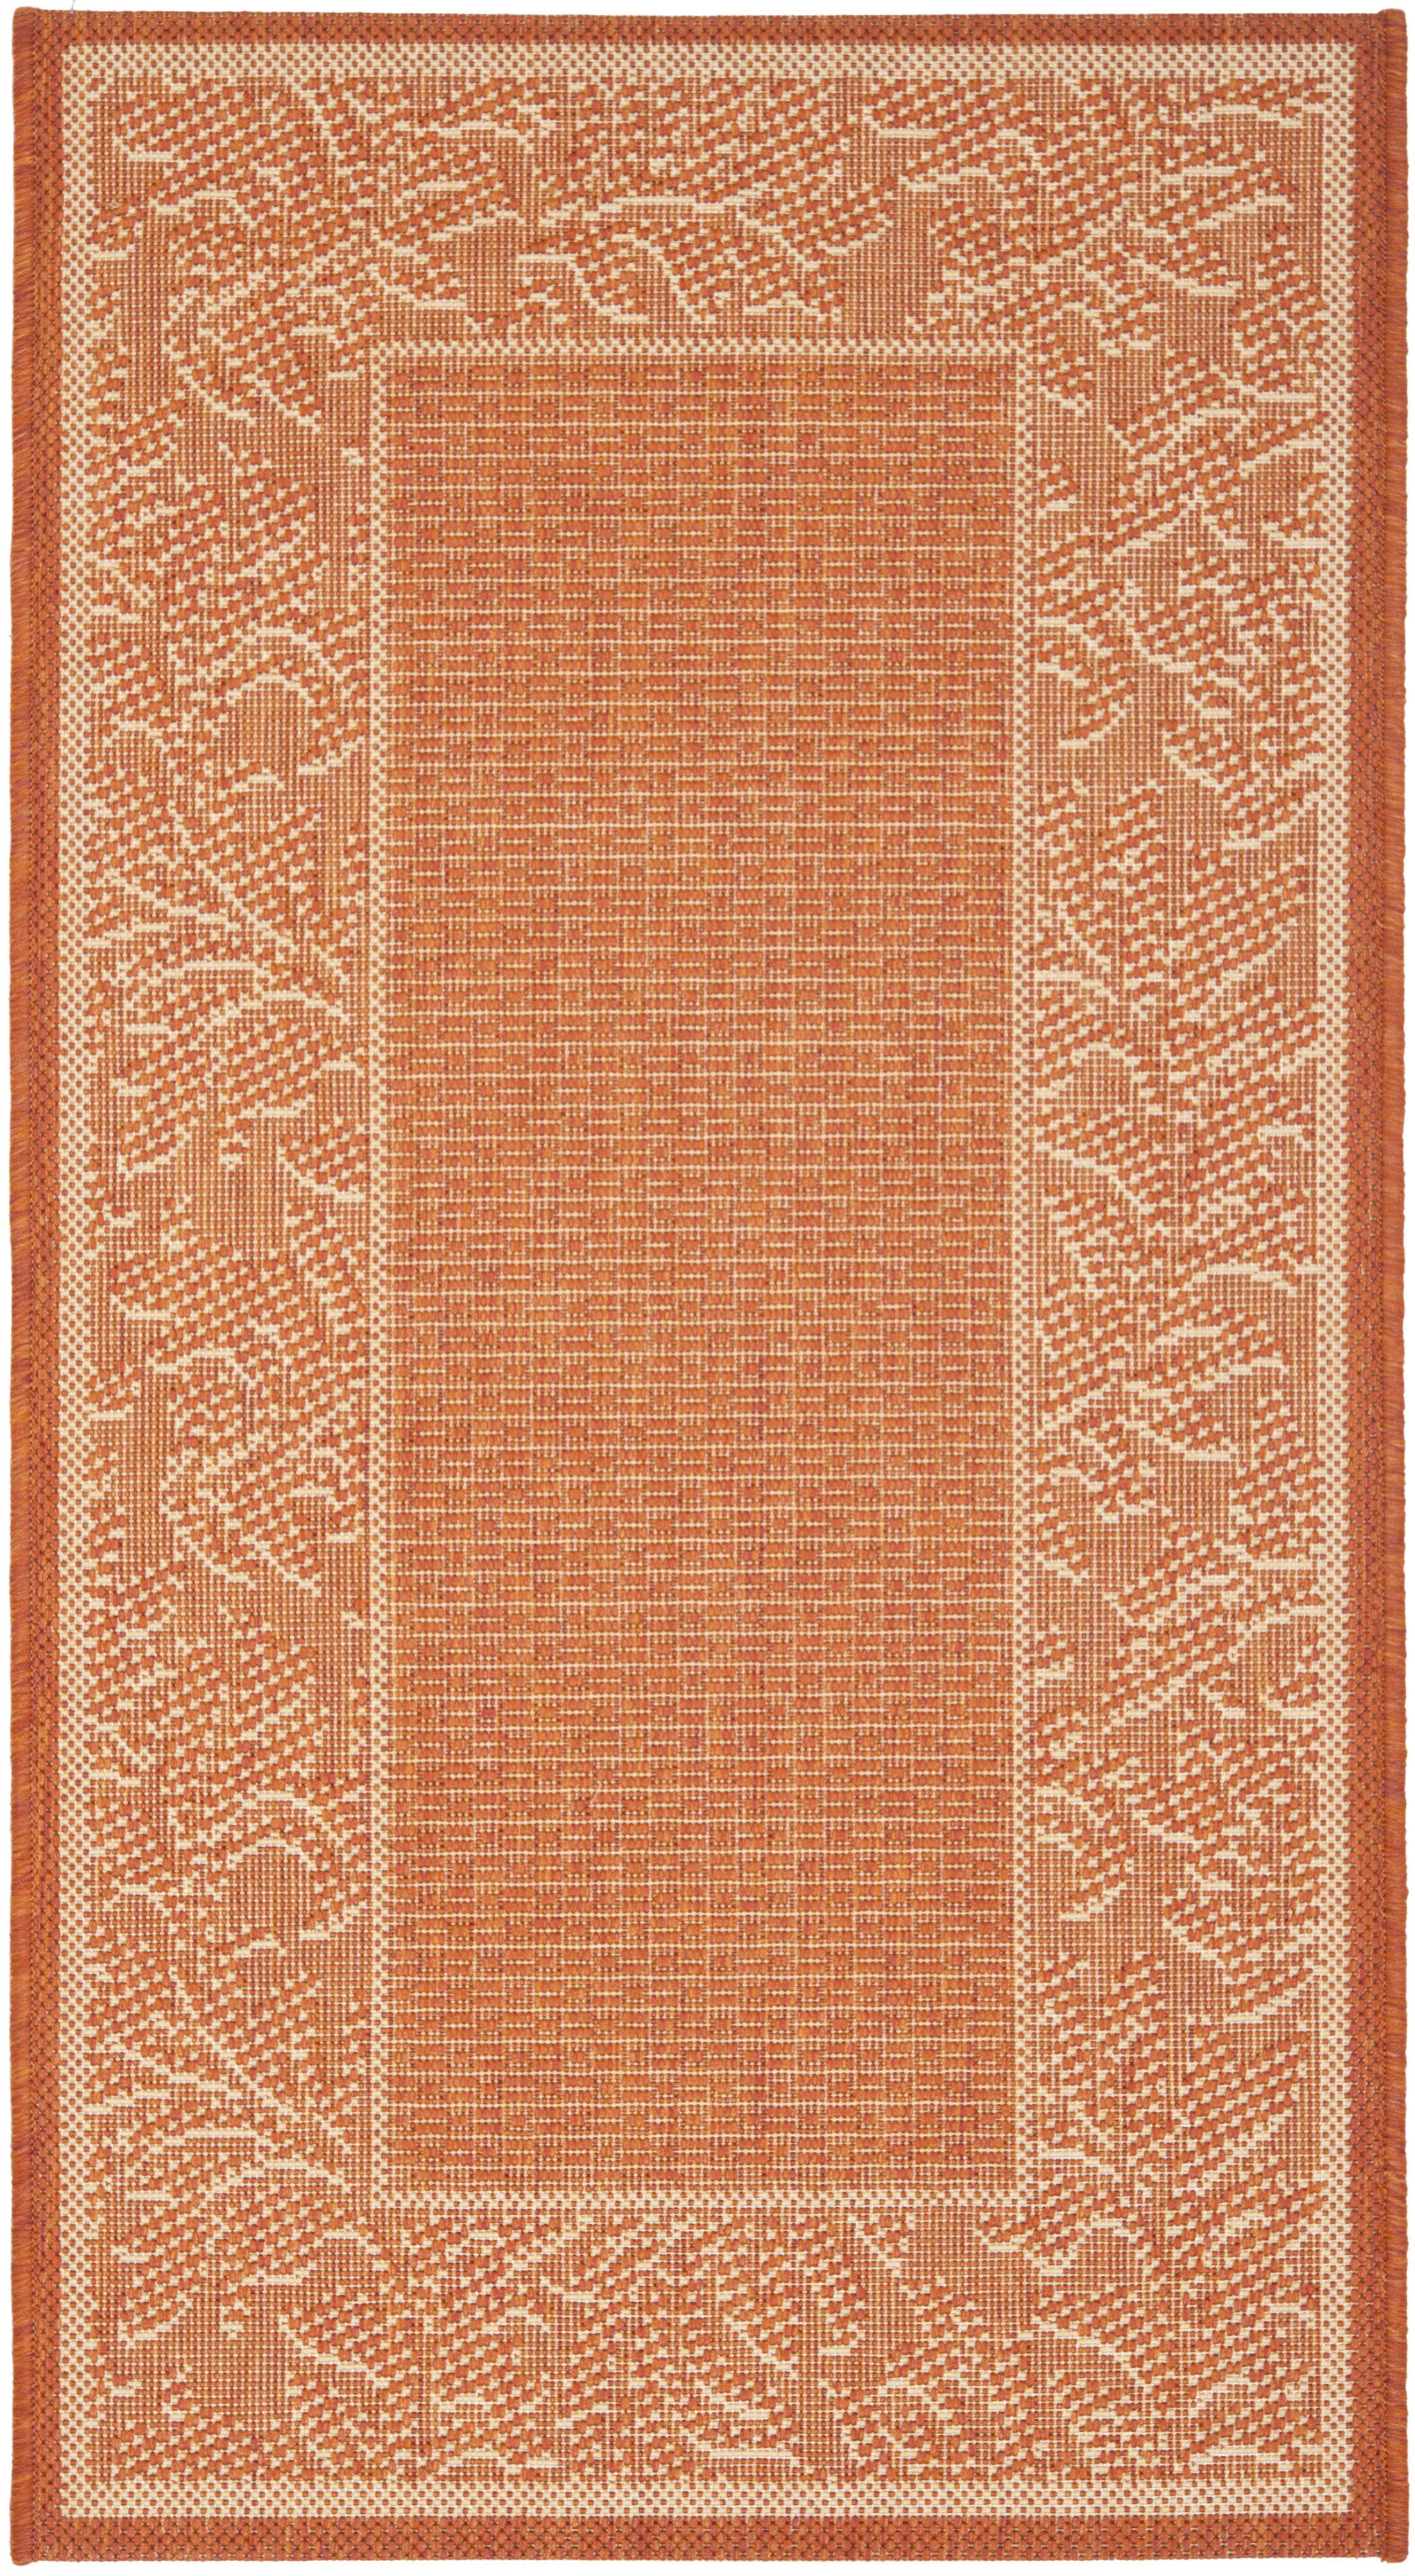 Octavius Terracotta/Natural Outdoor Rug Rug Size: Rectangle 2' x 3'7